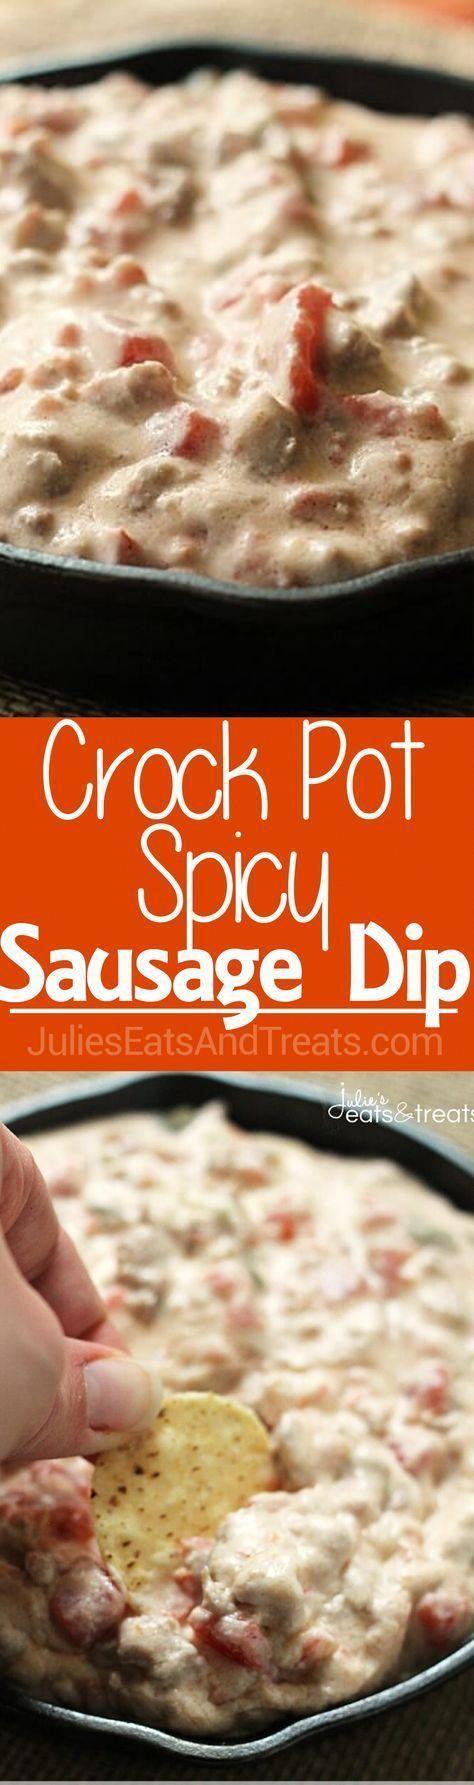 Crock Pot Spicy Sausage Dip Creamy Delicious Dip Loaded with Sausage and a Kick via Julie Evink Crock Pot Spicy Sausage Dip Creamy Delicious Dip Loaded with Sausage and a...